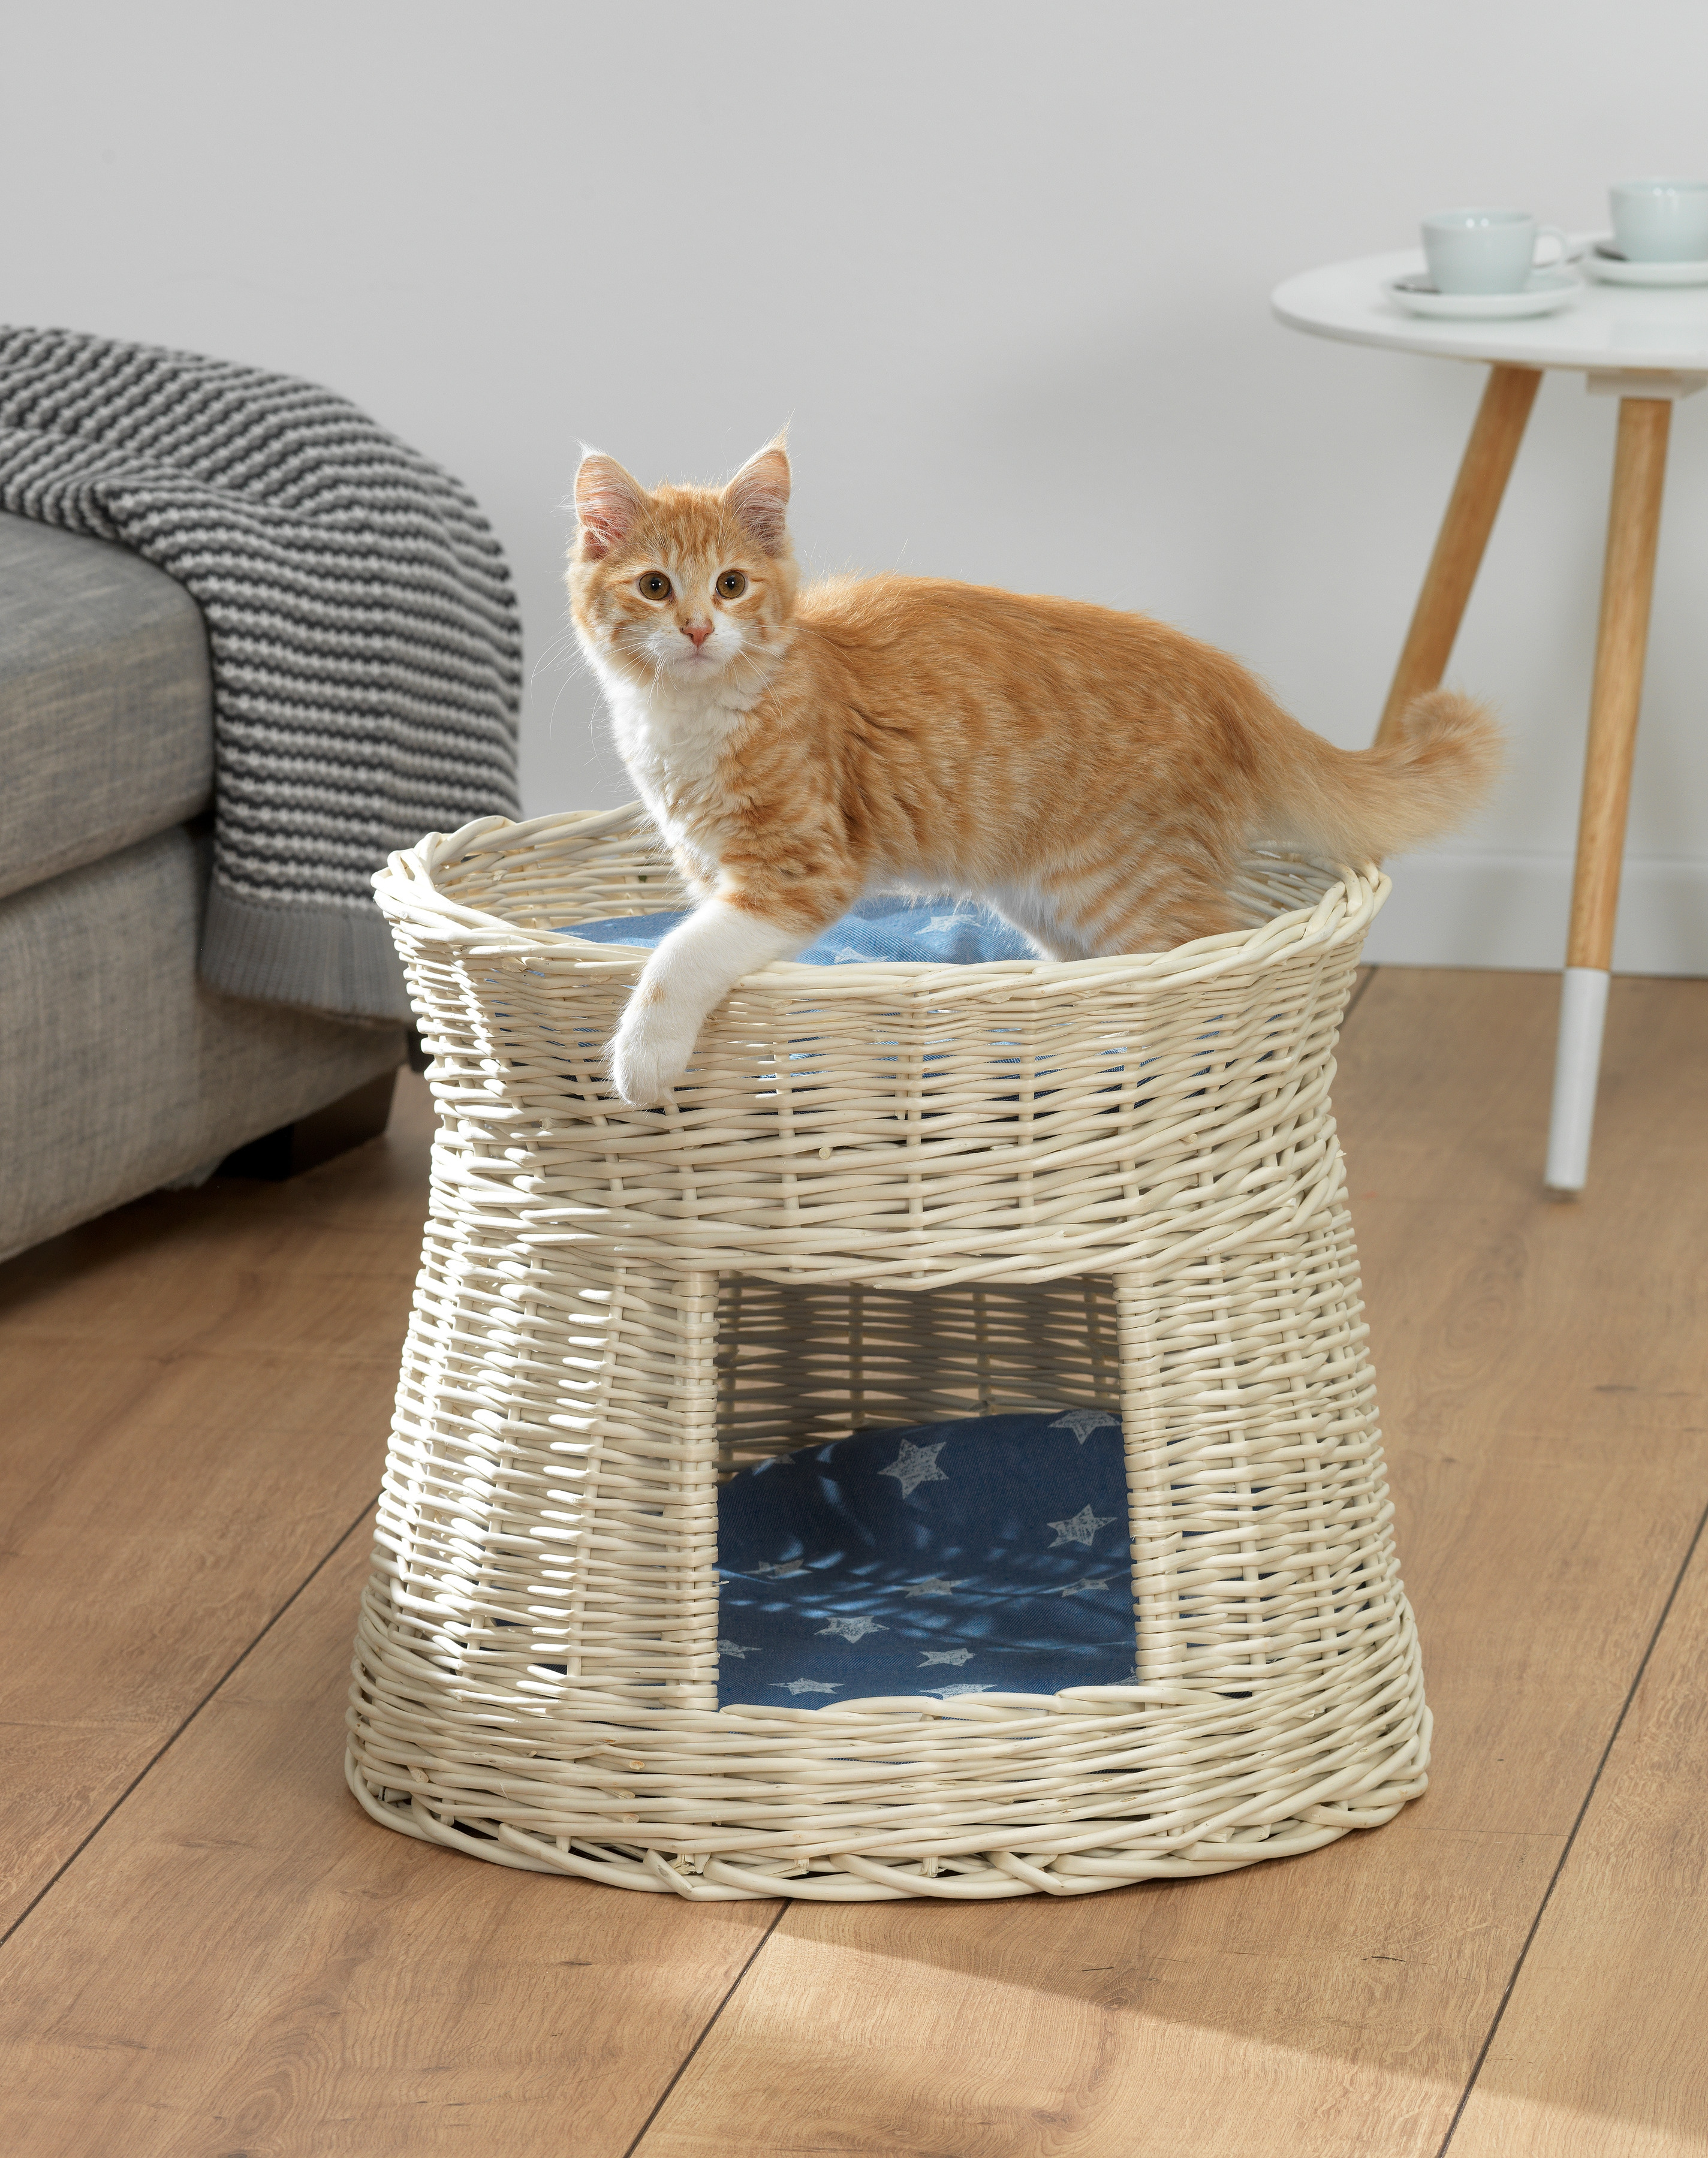 Silvio Design Katzen-Korbturm »Starlett« inkl. Kissen   Garten > Tiermöbel > Katzenkörbe   Weiß   SILVIO DESIGN